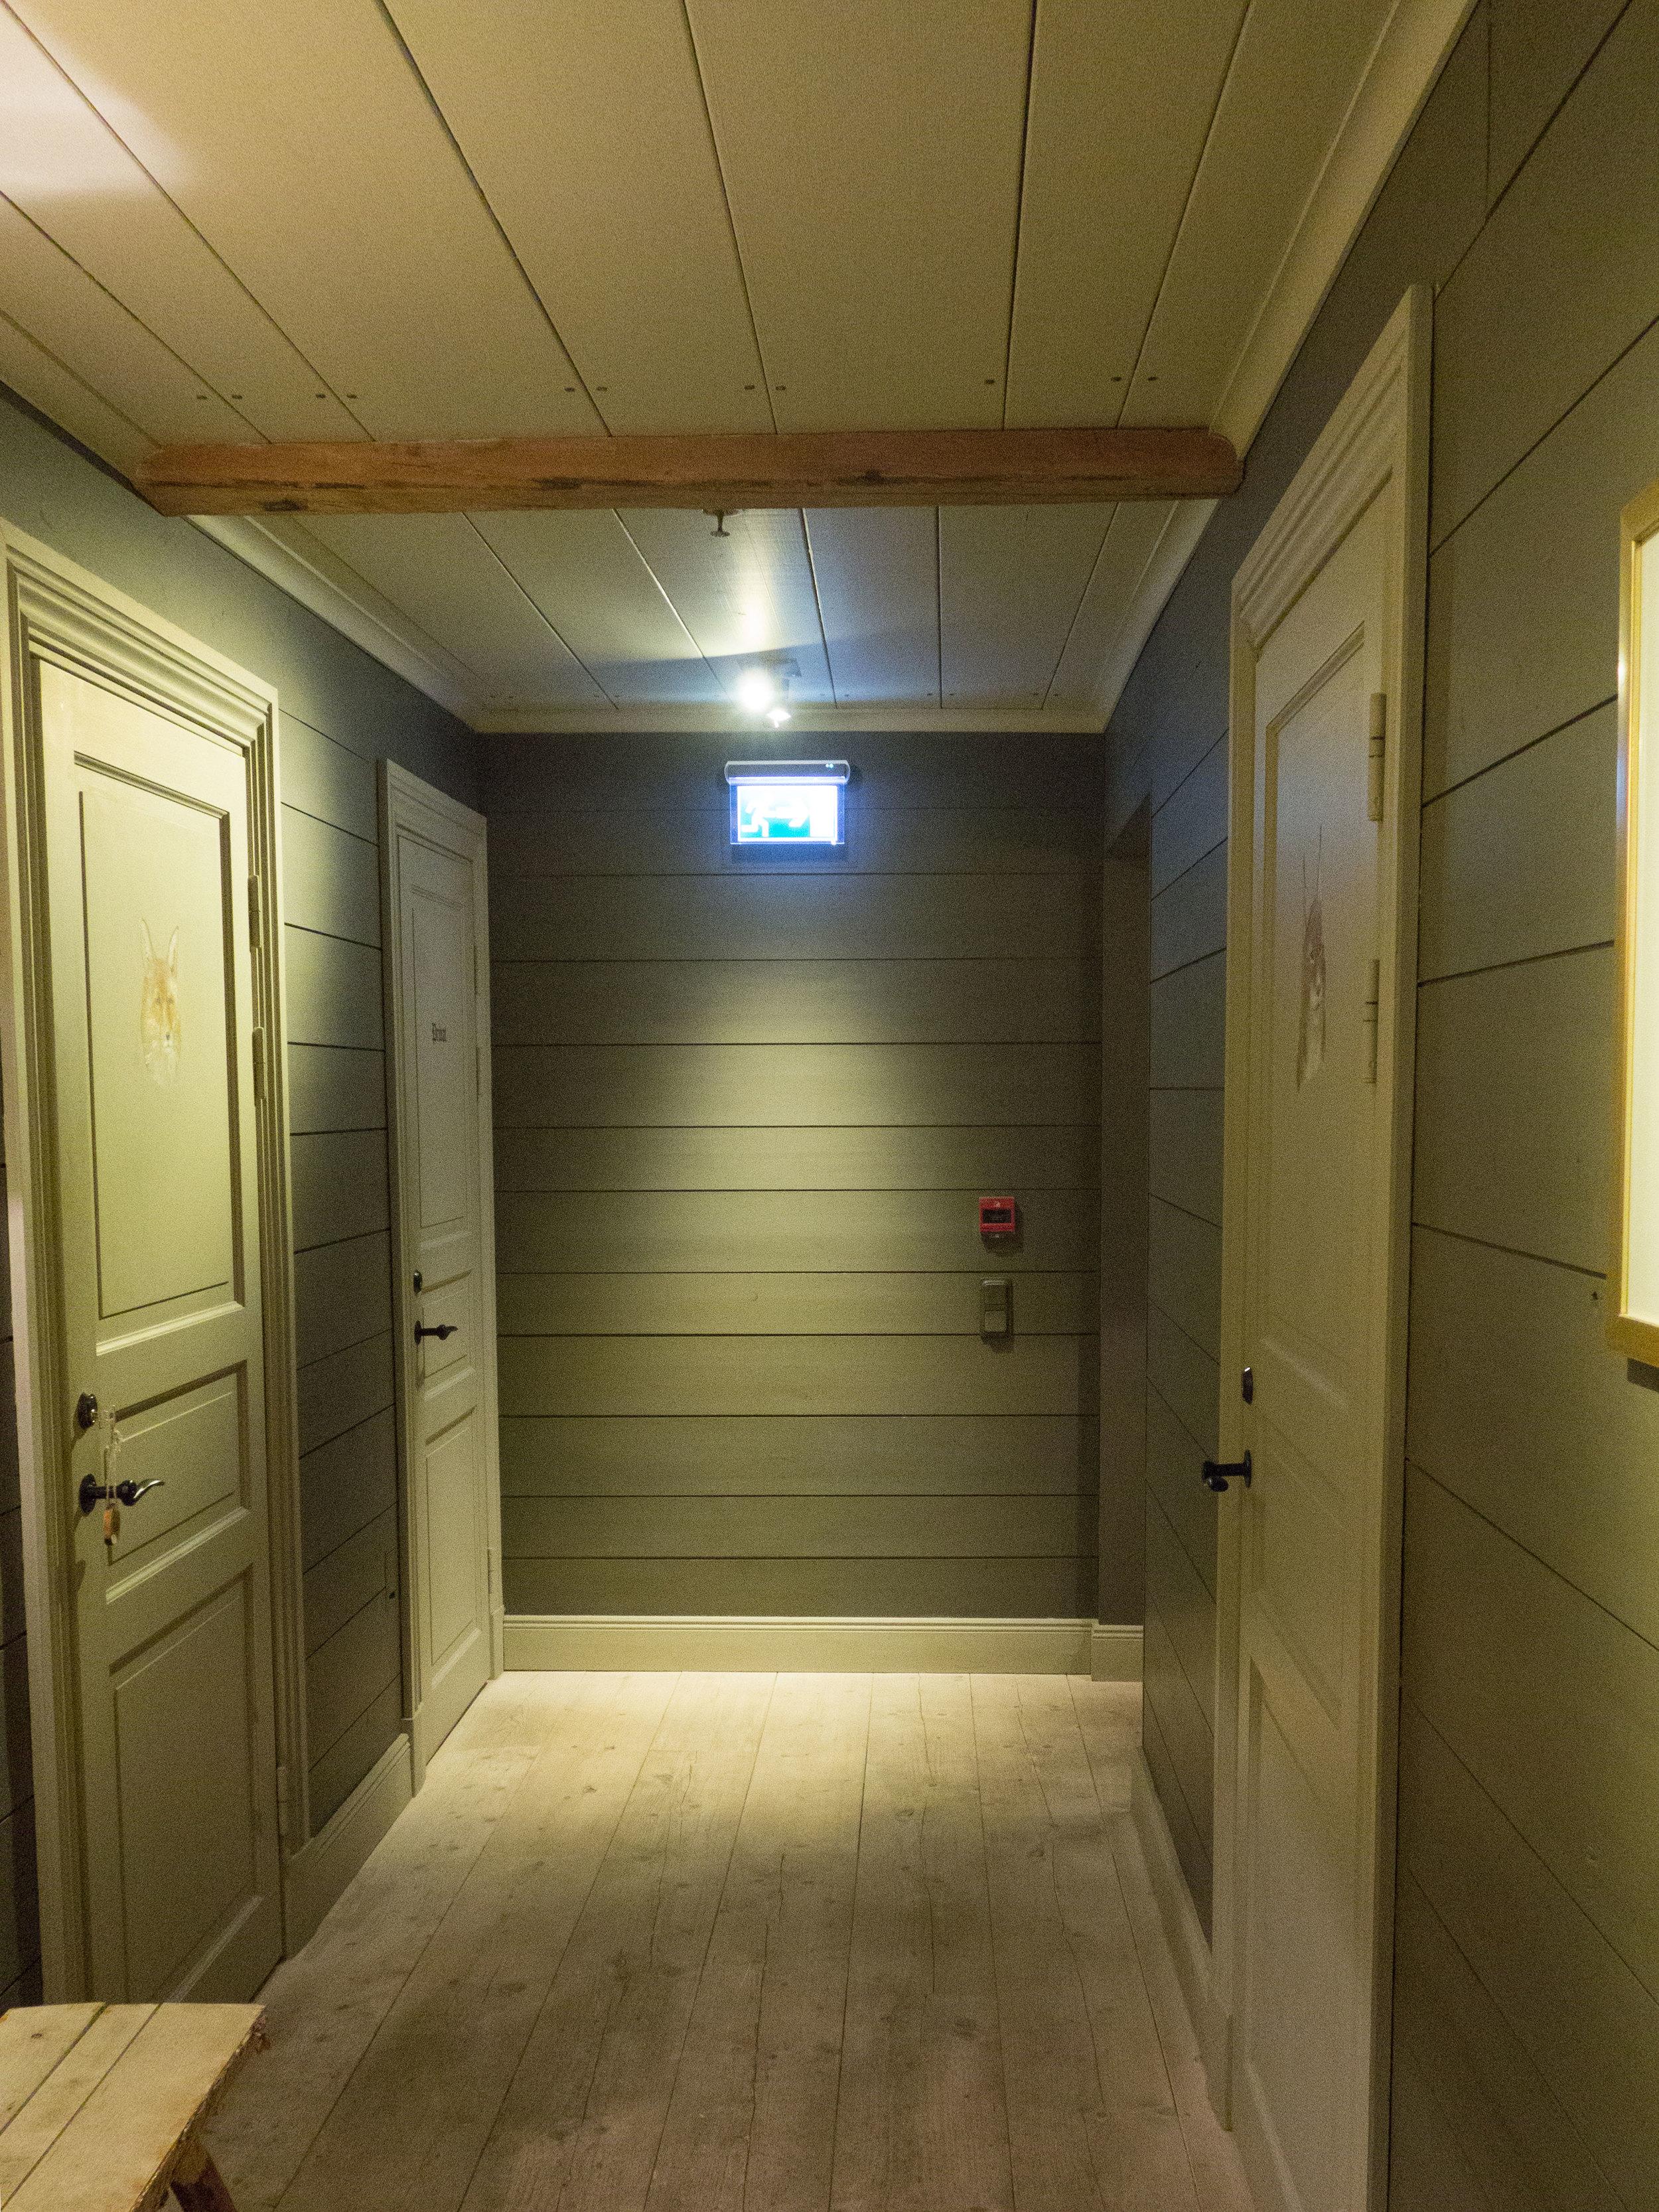 Fäviken Are Sweden Hotel Review